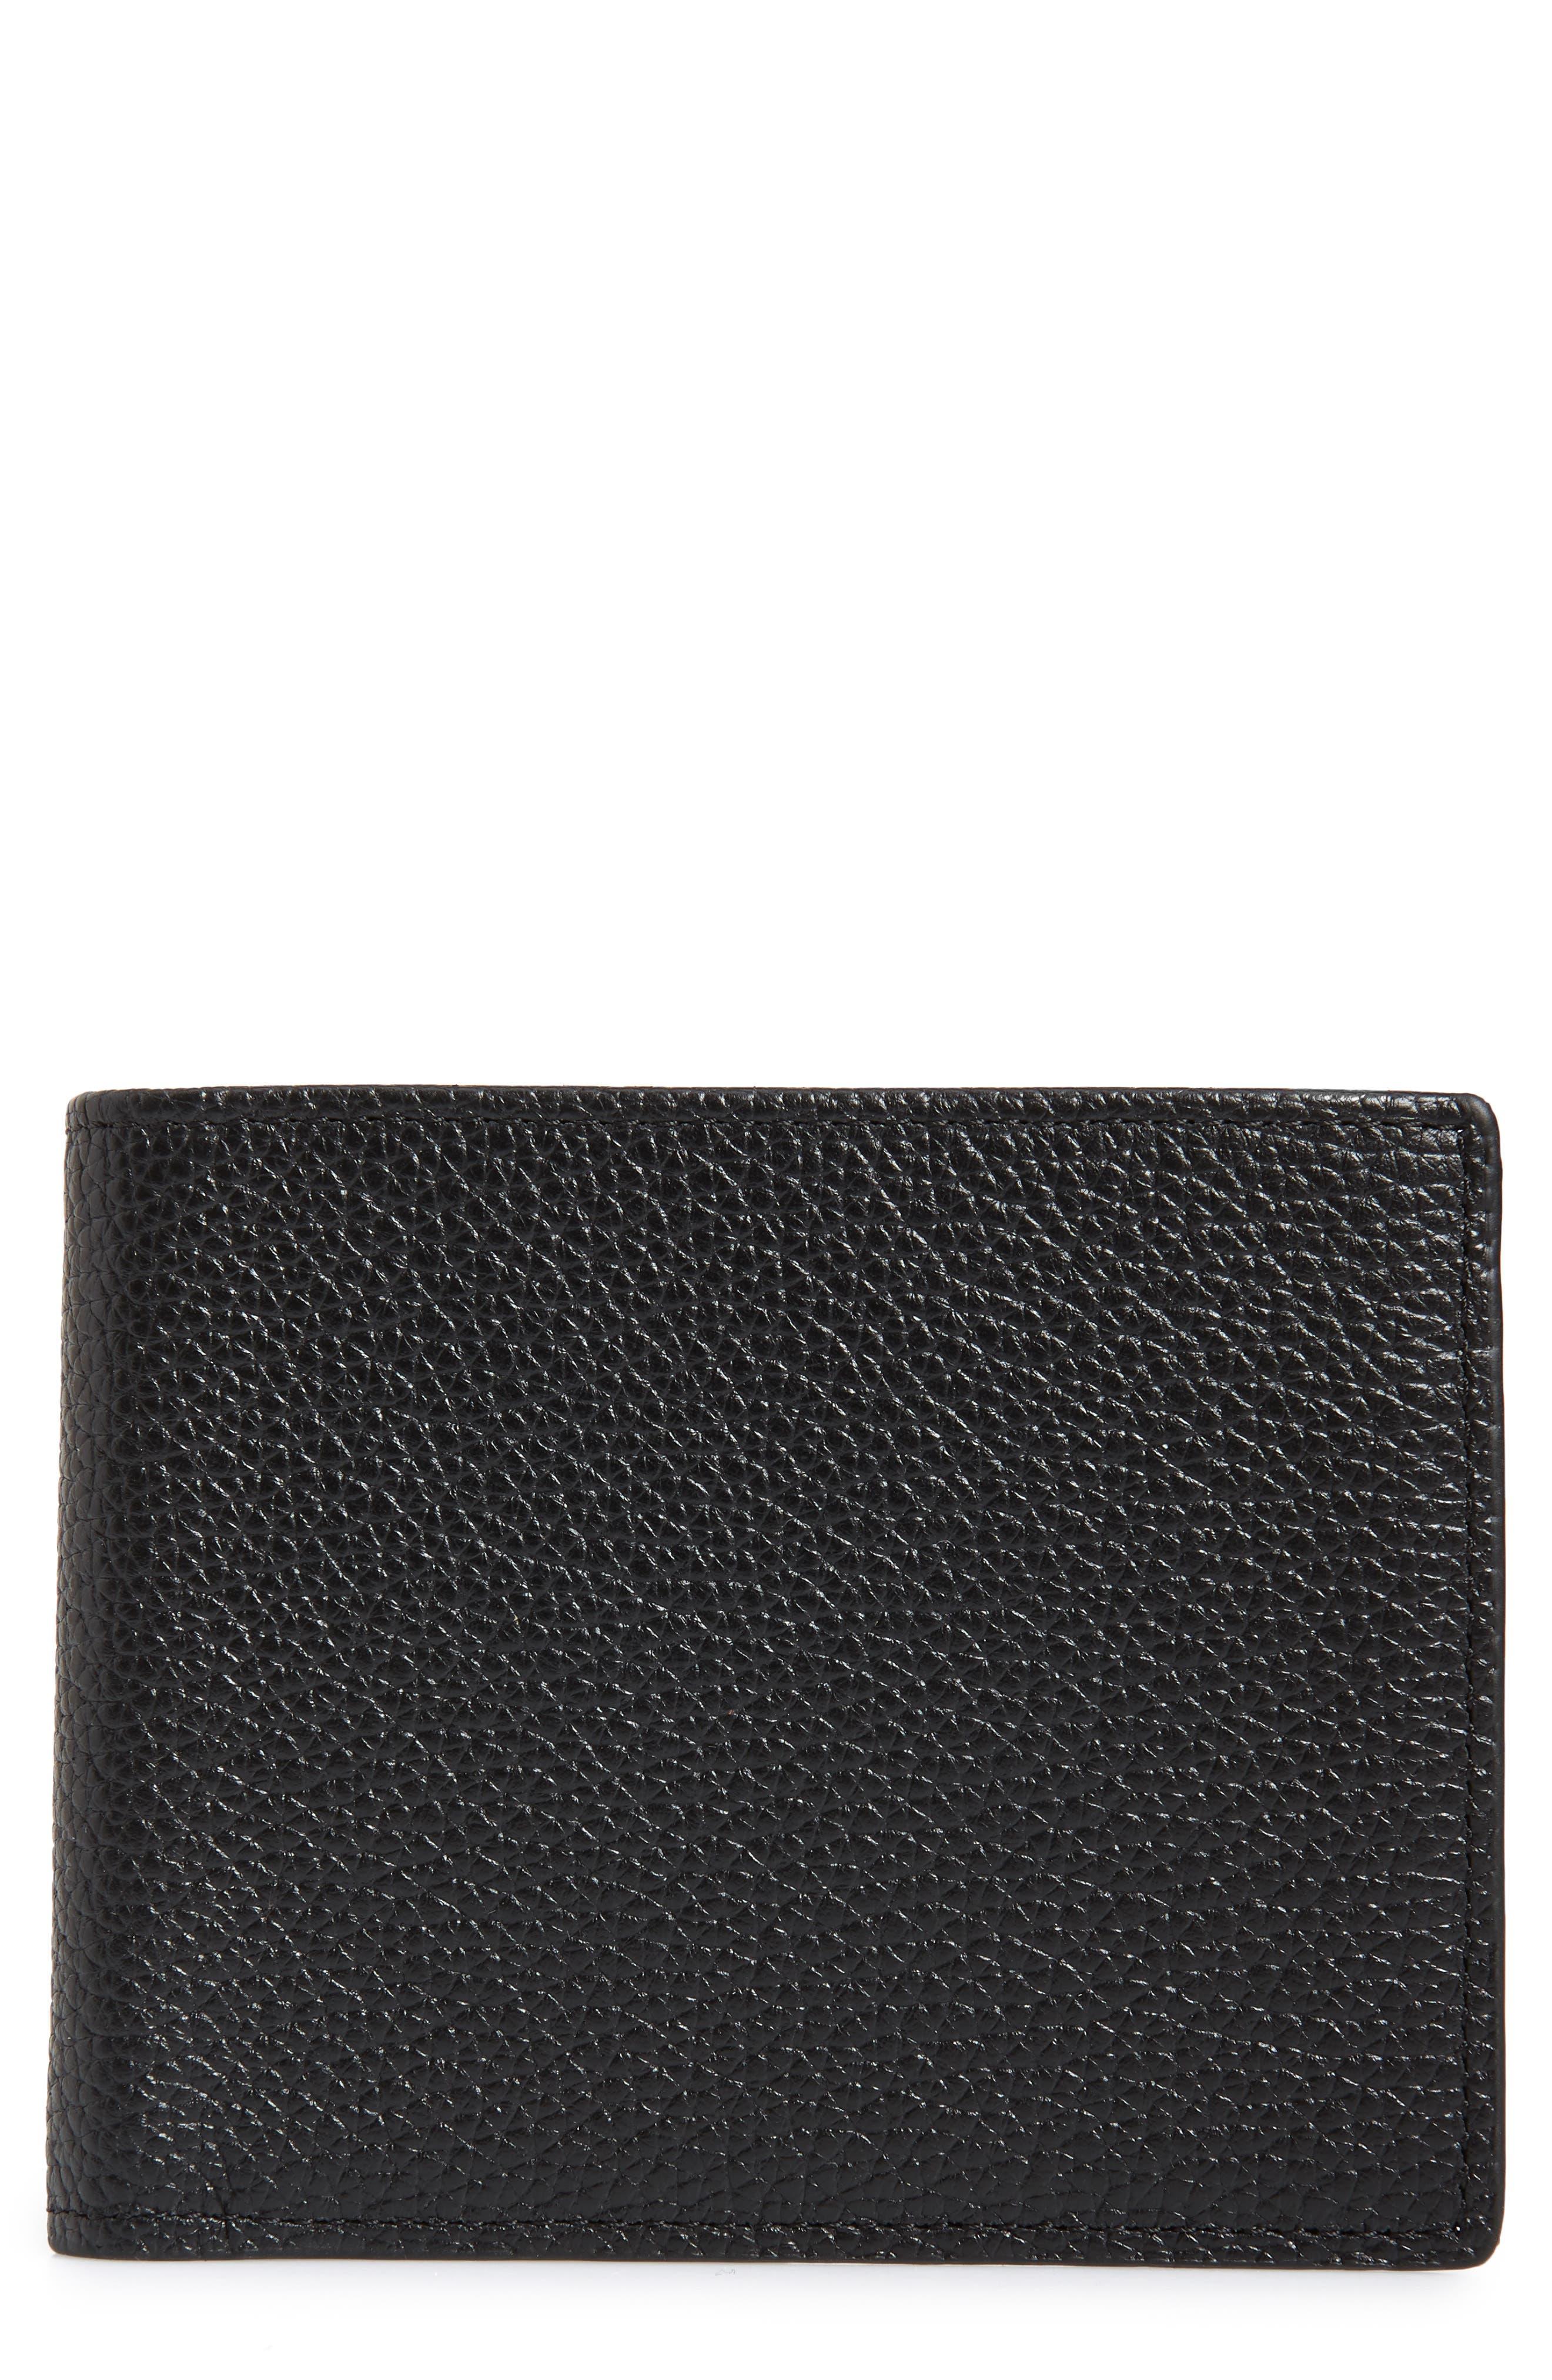 Midland RFID Leather Wallet,                         Main,                         color, BLACK